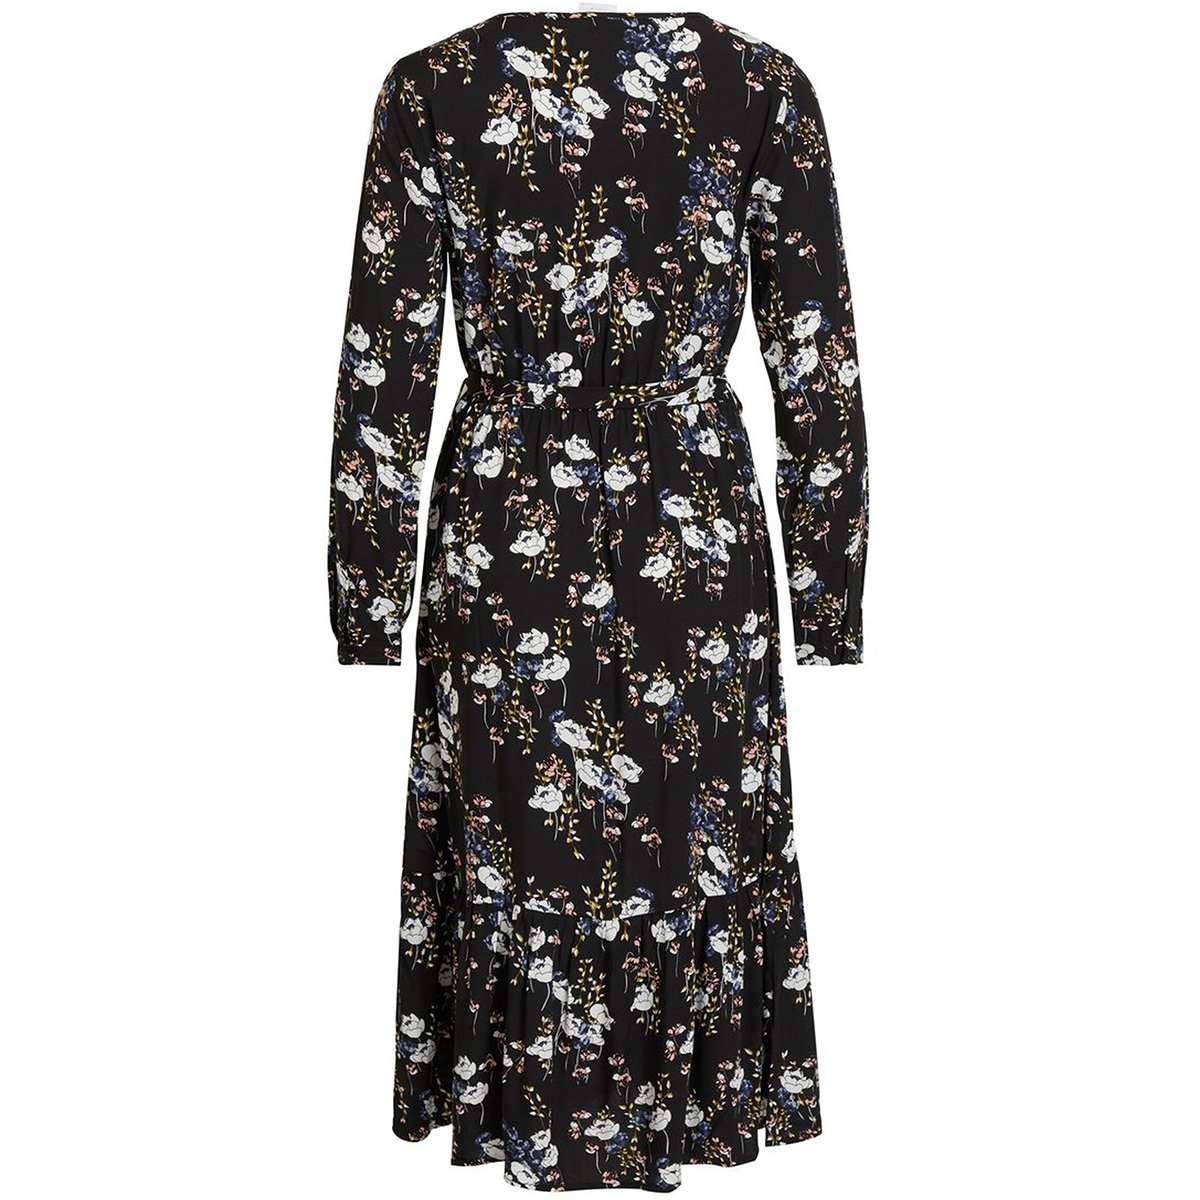 vianny l/s midi dress /rx 14058011 vila jurk black/flowers